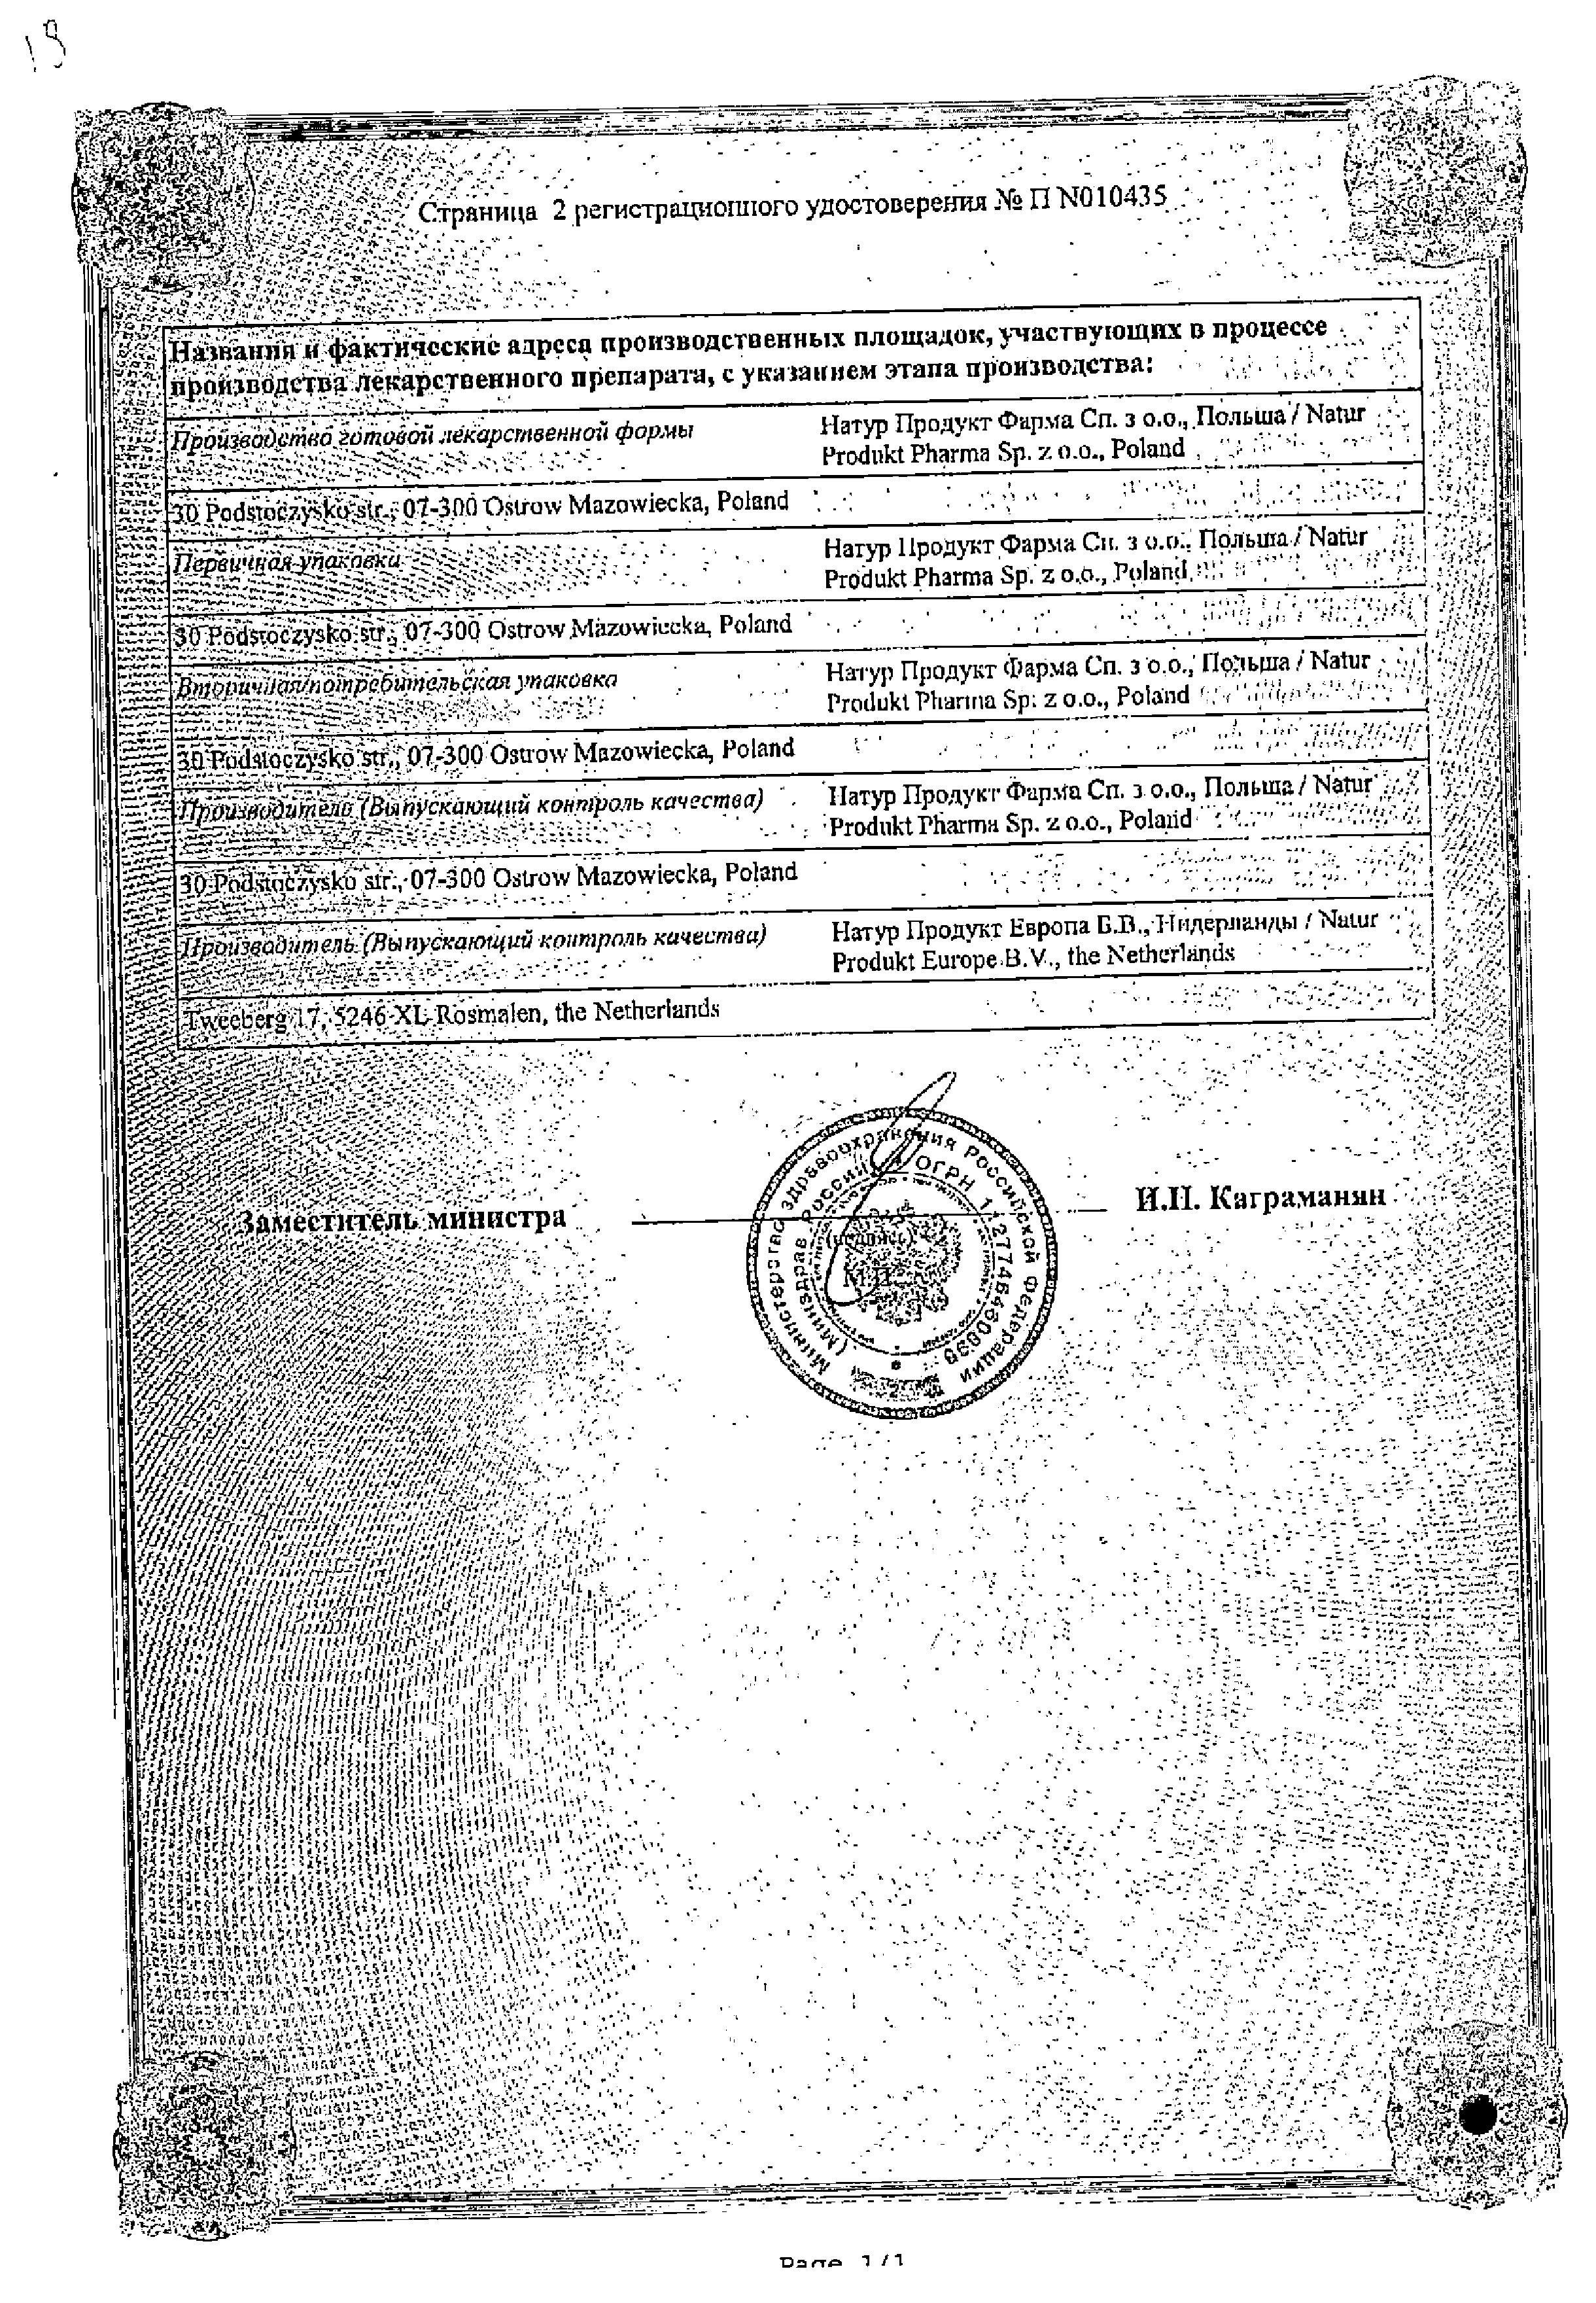 Магний плюс сертификат